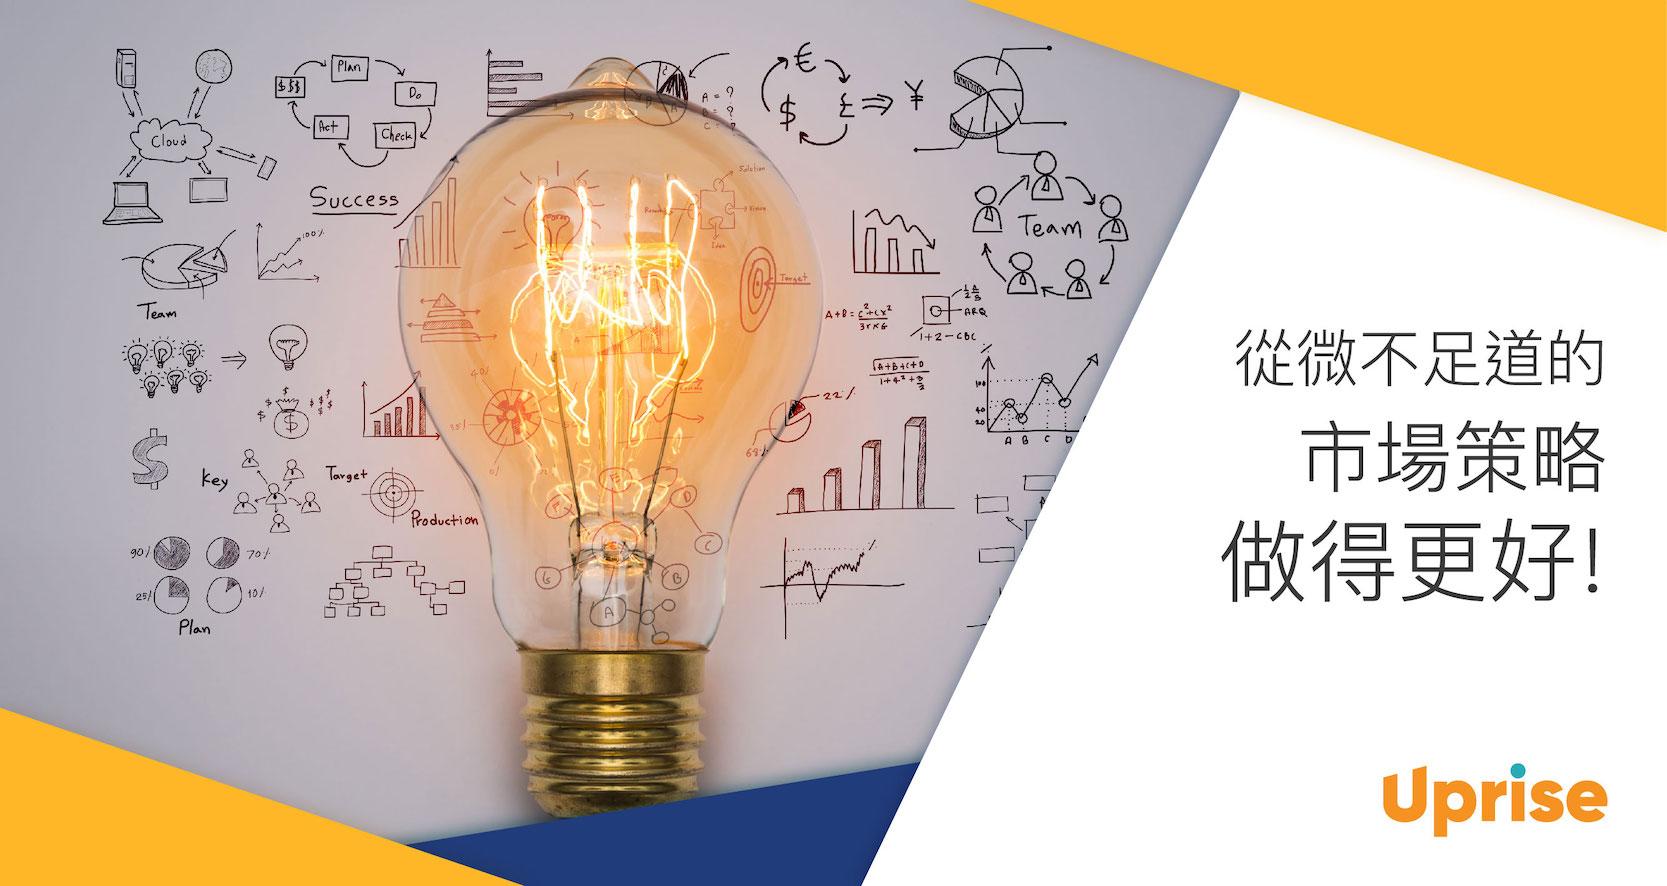 Uprise - Business Insights - 【從微不足道的市場策略做得更好!】